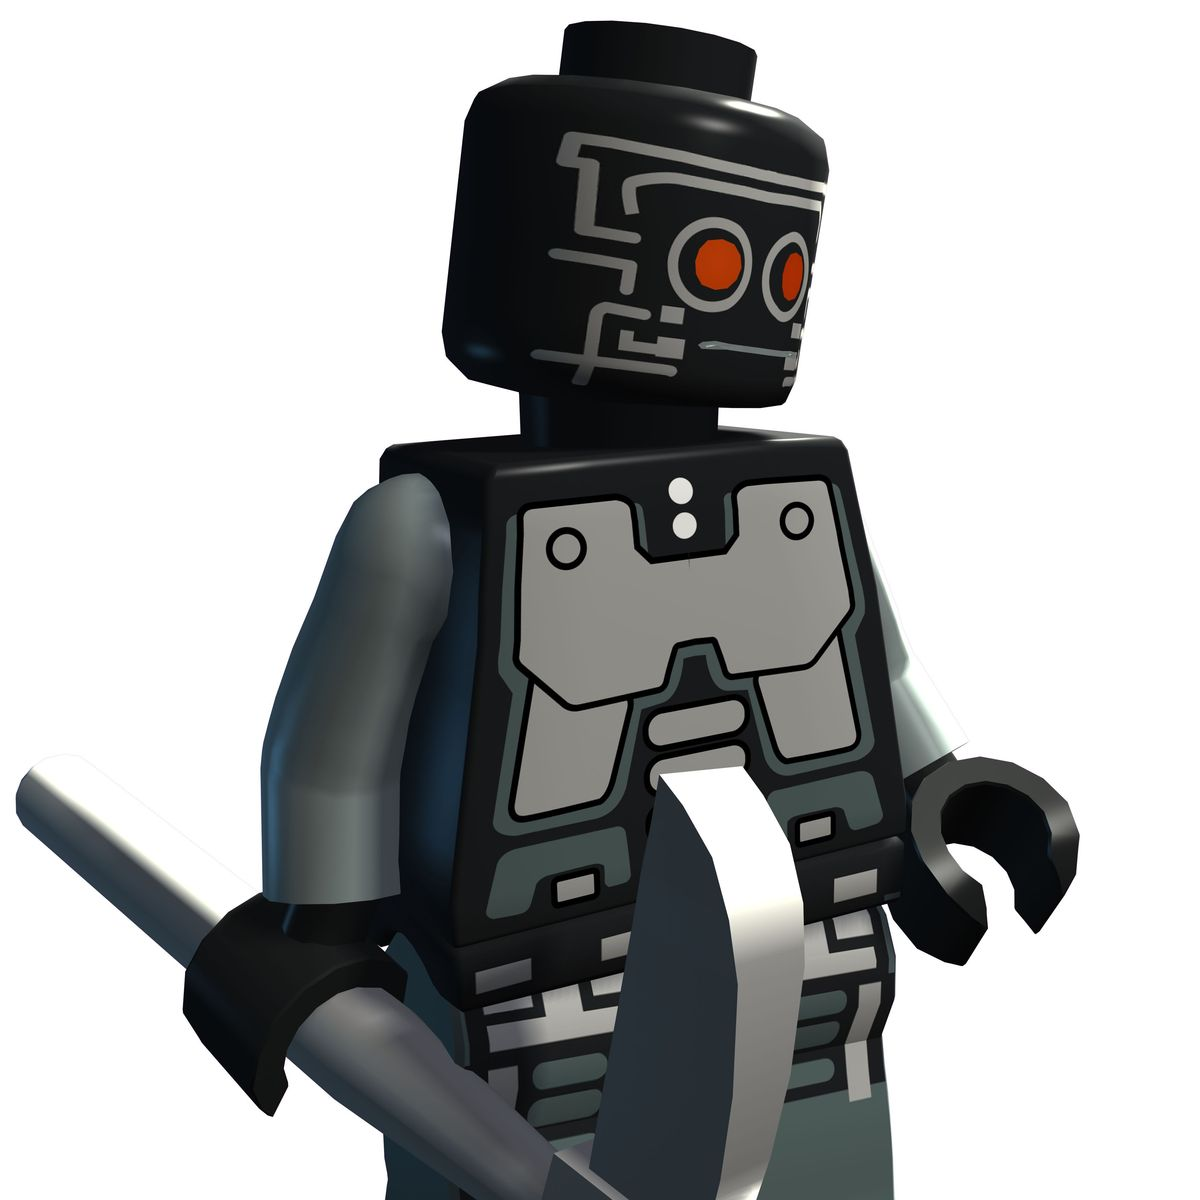 File:Astro Droid.jpg